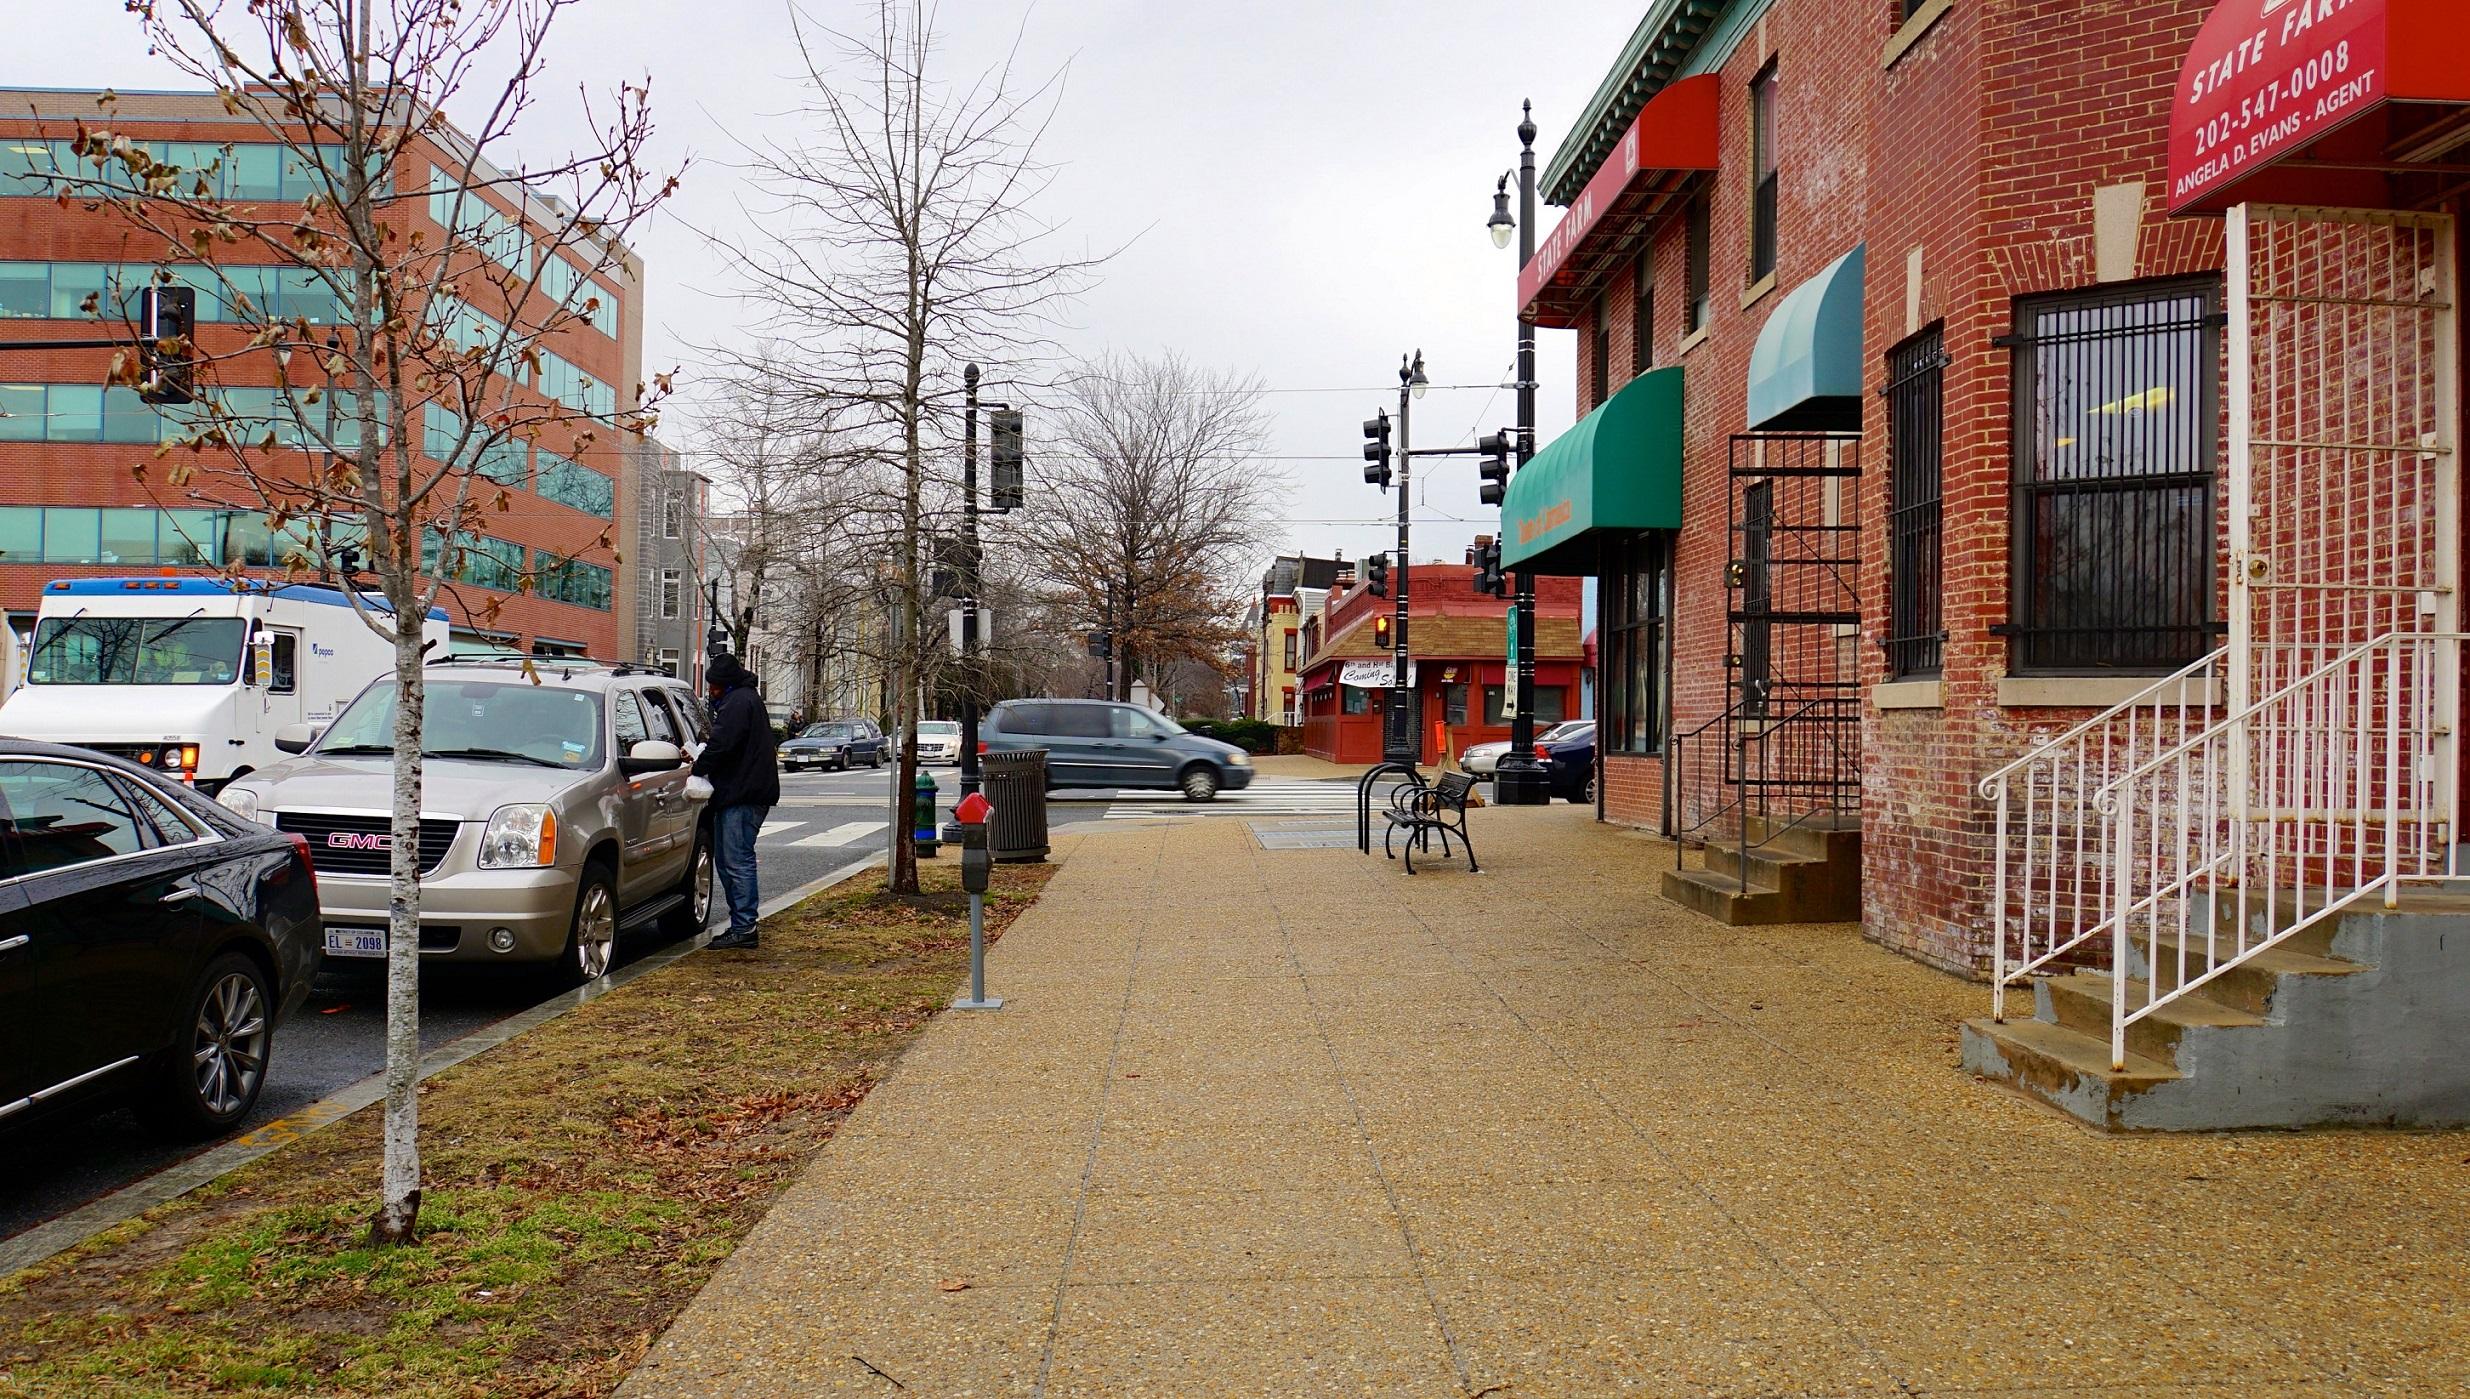 Pedestrian pass shuttered buildings in Ward 8 in Washington DC.